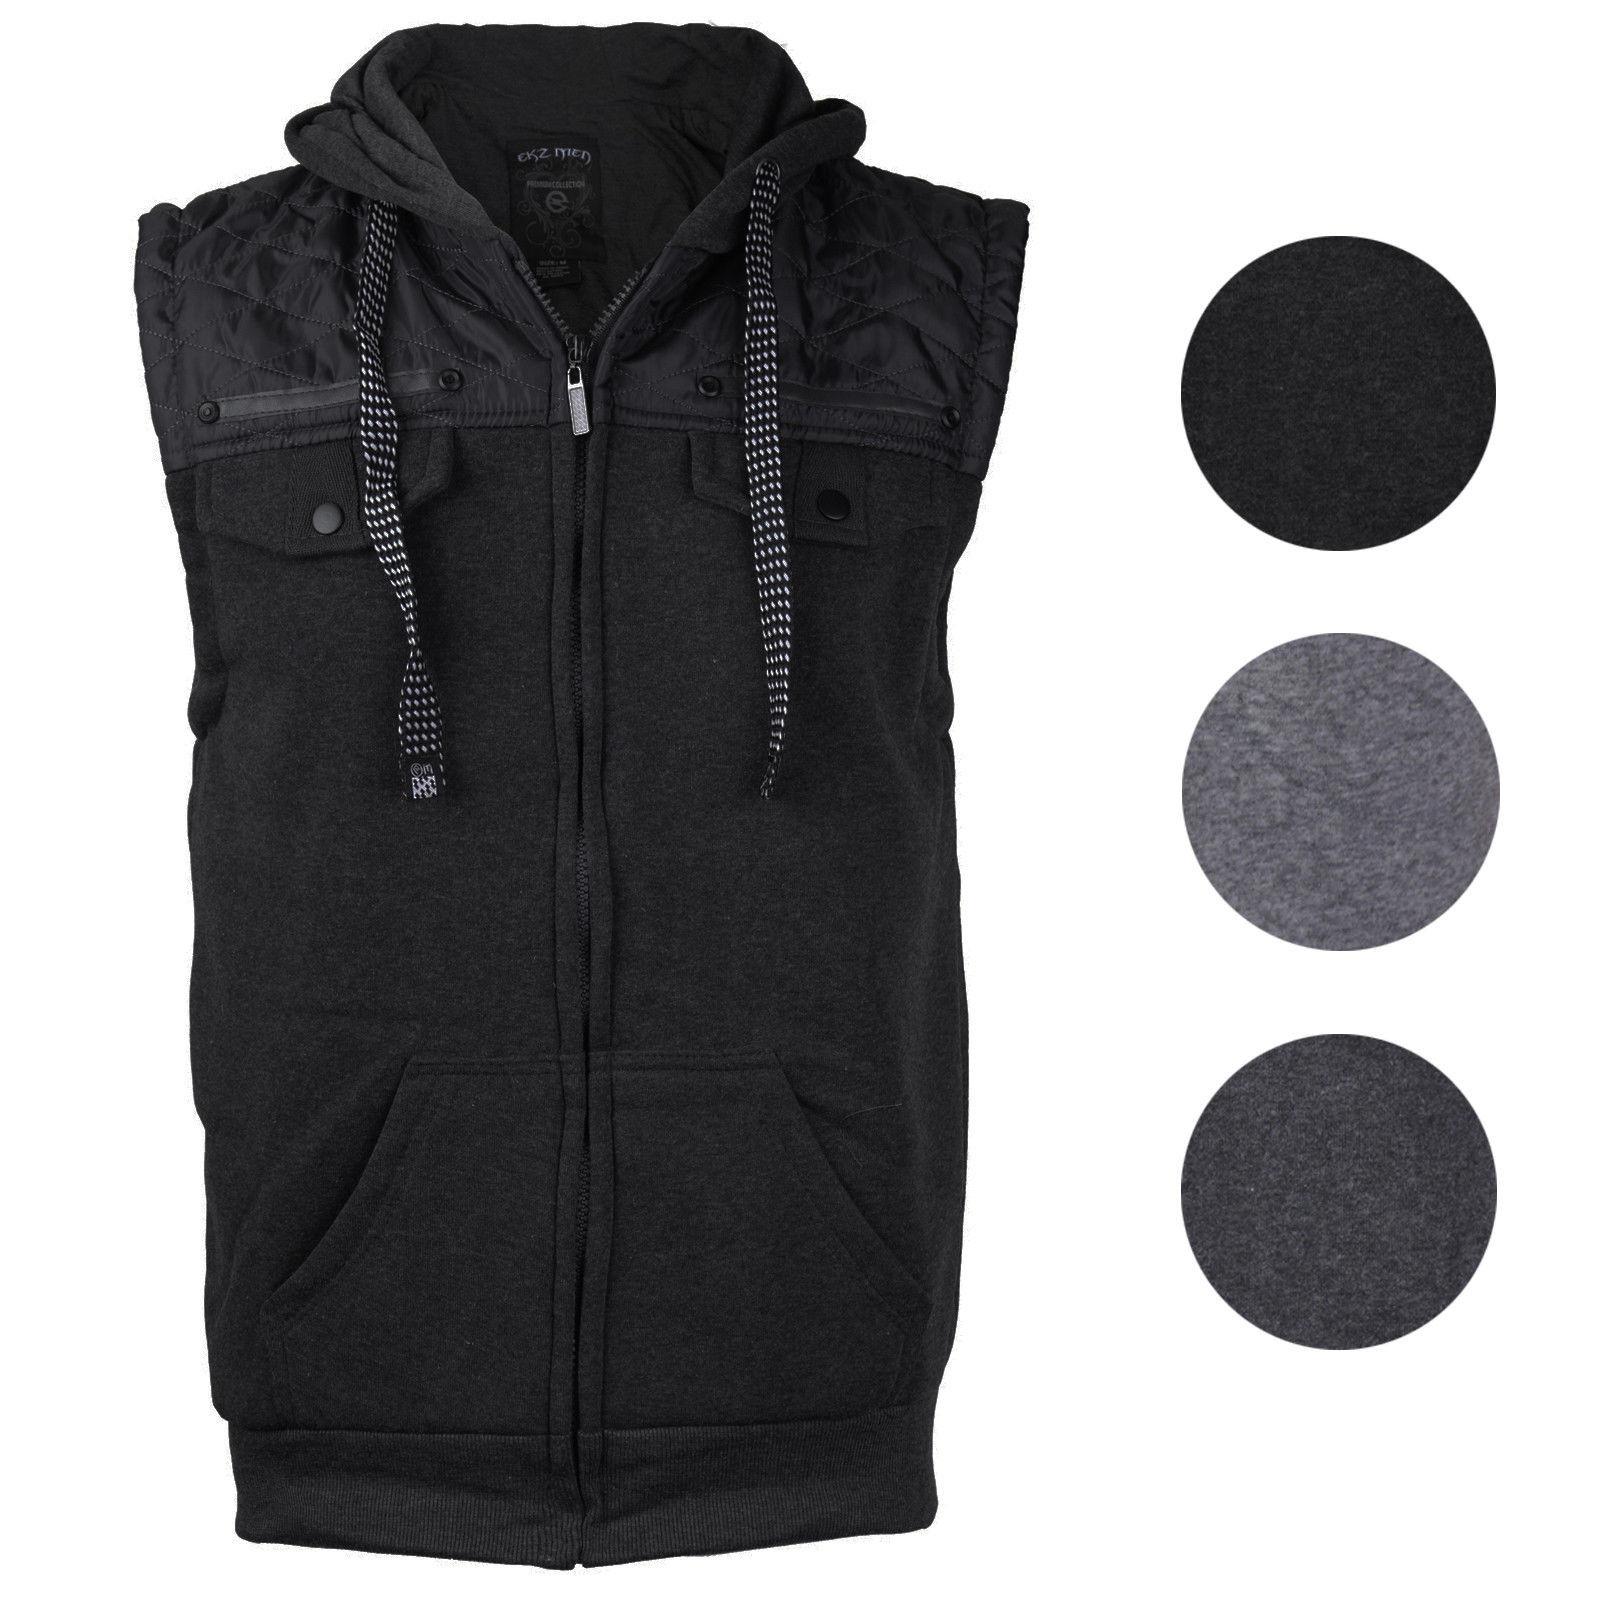 EKZ Men's Casual Zip Up Drawstring Hooded Athletic Sports Fashion Vest EK1645VK